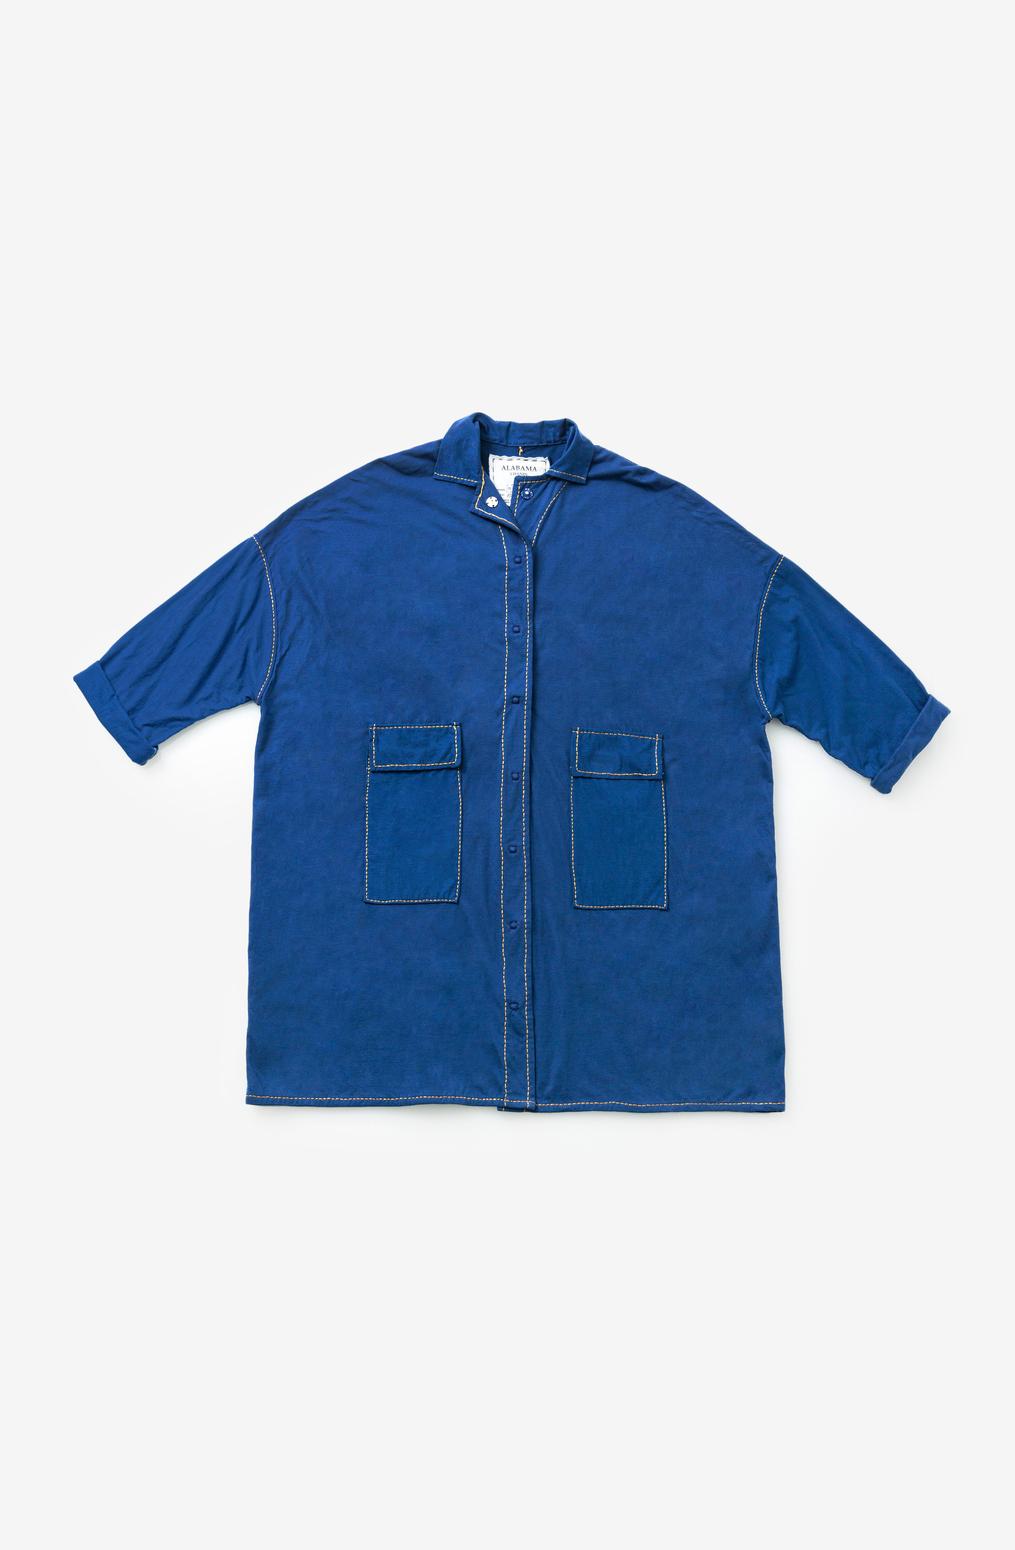 Car coat   basic   venetian   c29   23467   abraham rowe %281%29   edit